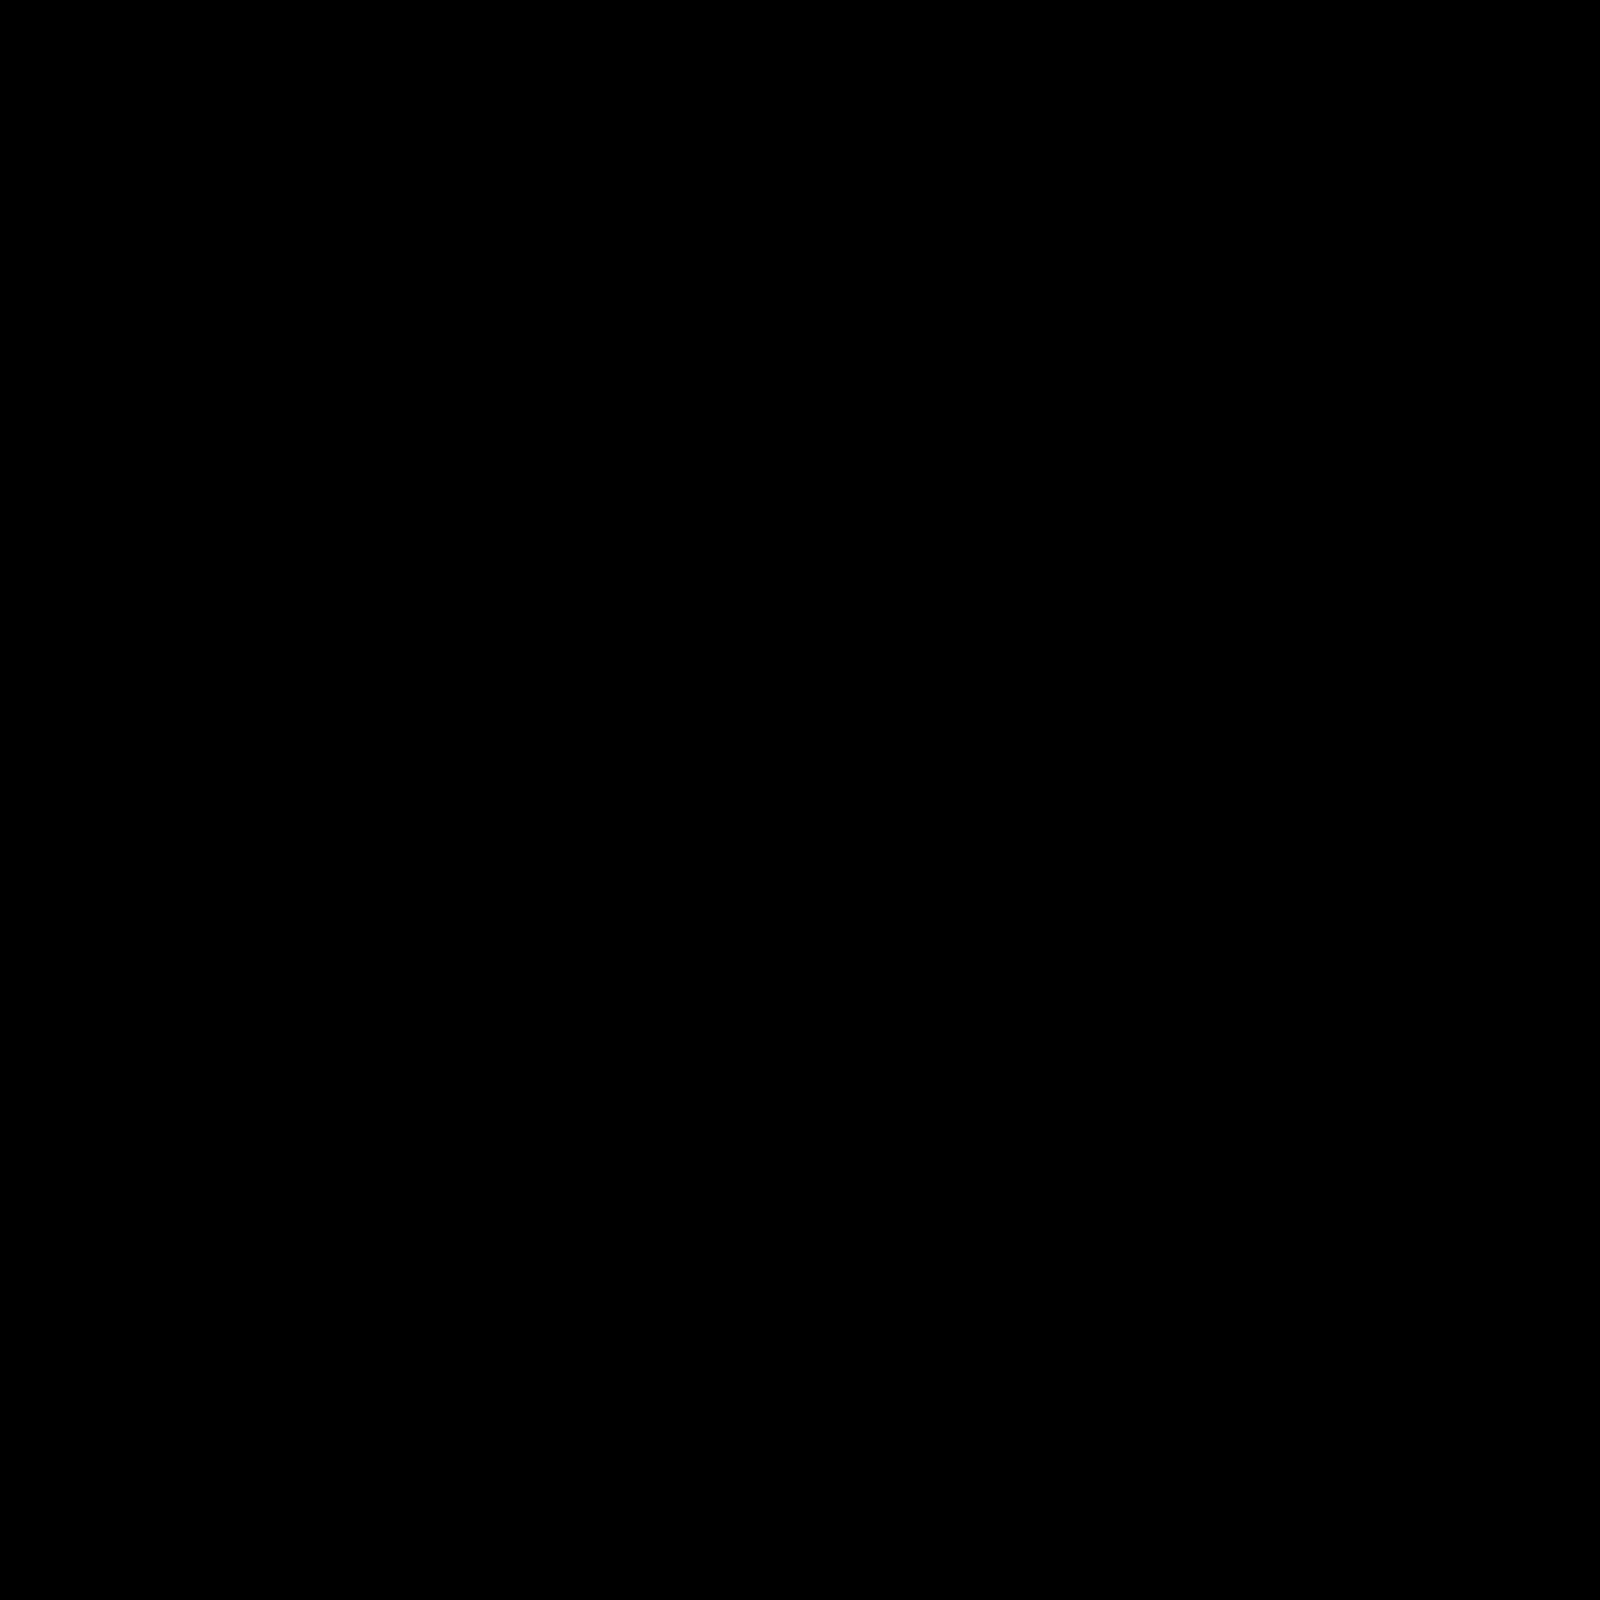 Hiragana Hi icon